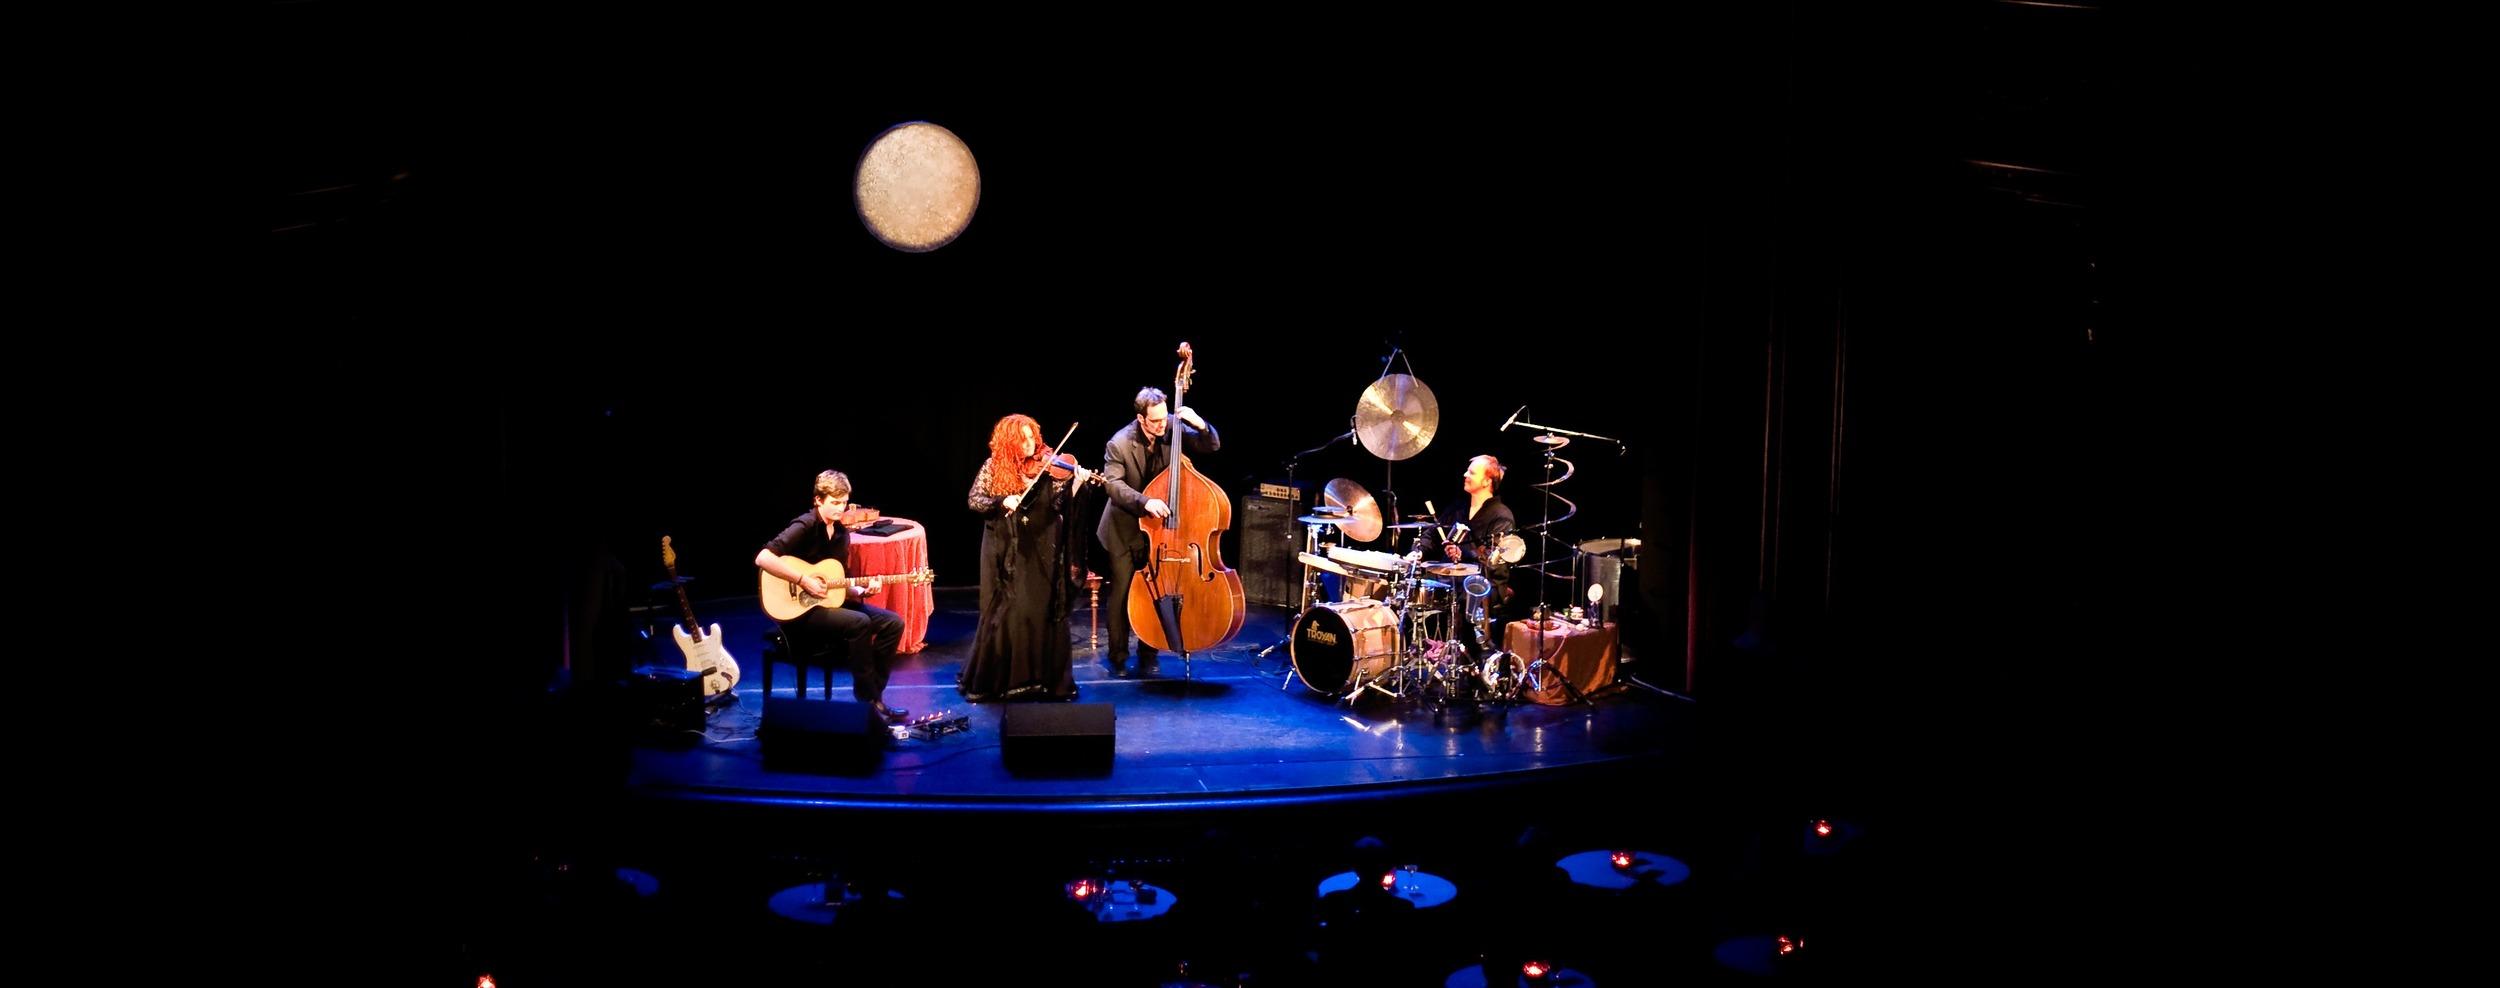 Martina Eisenreich Quartet (live). Fotography by Mike Meyer.